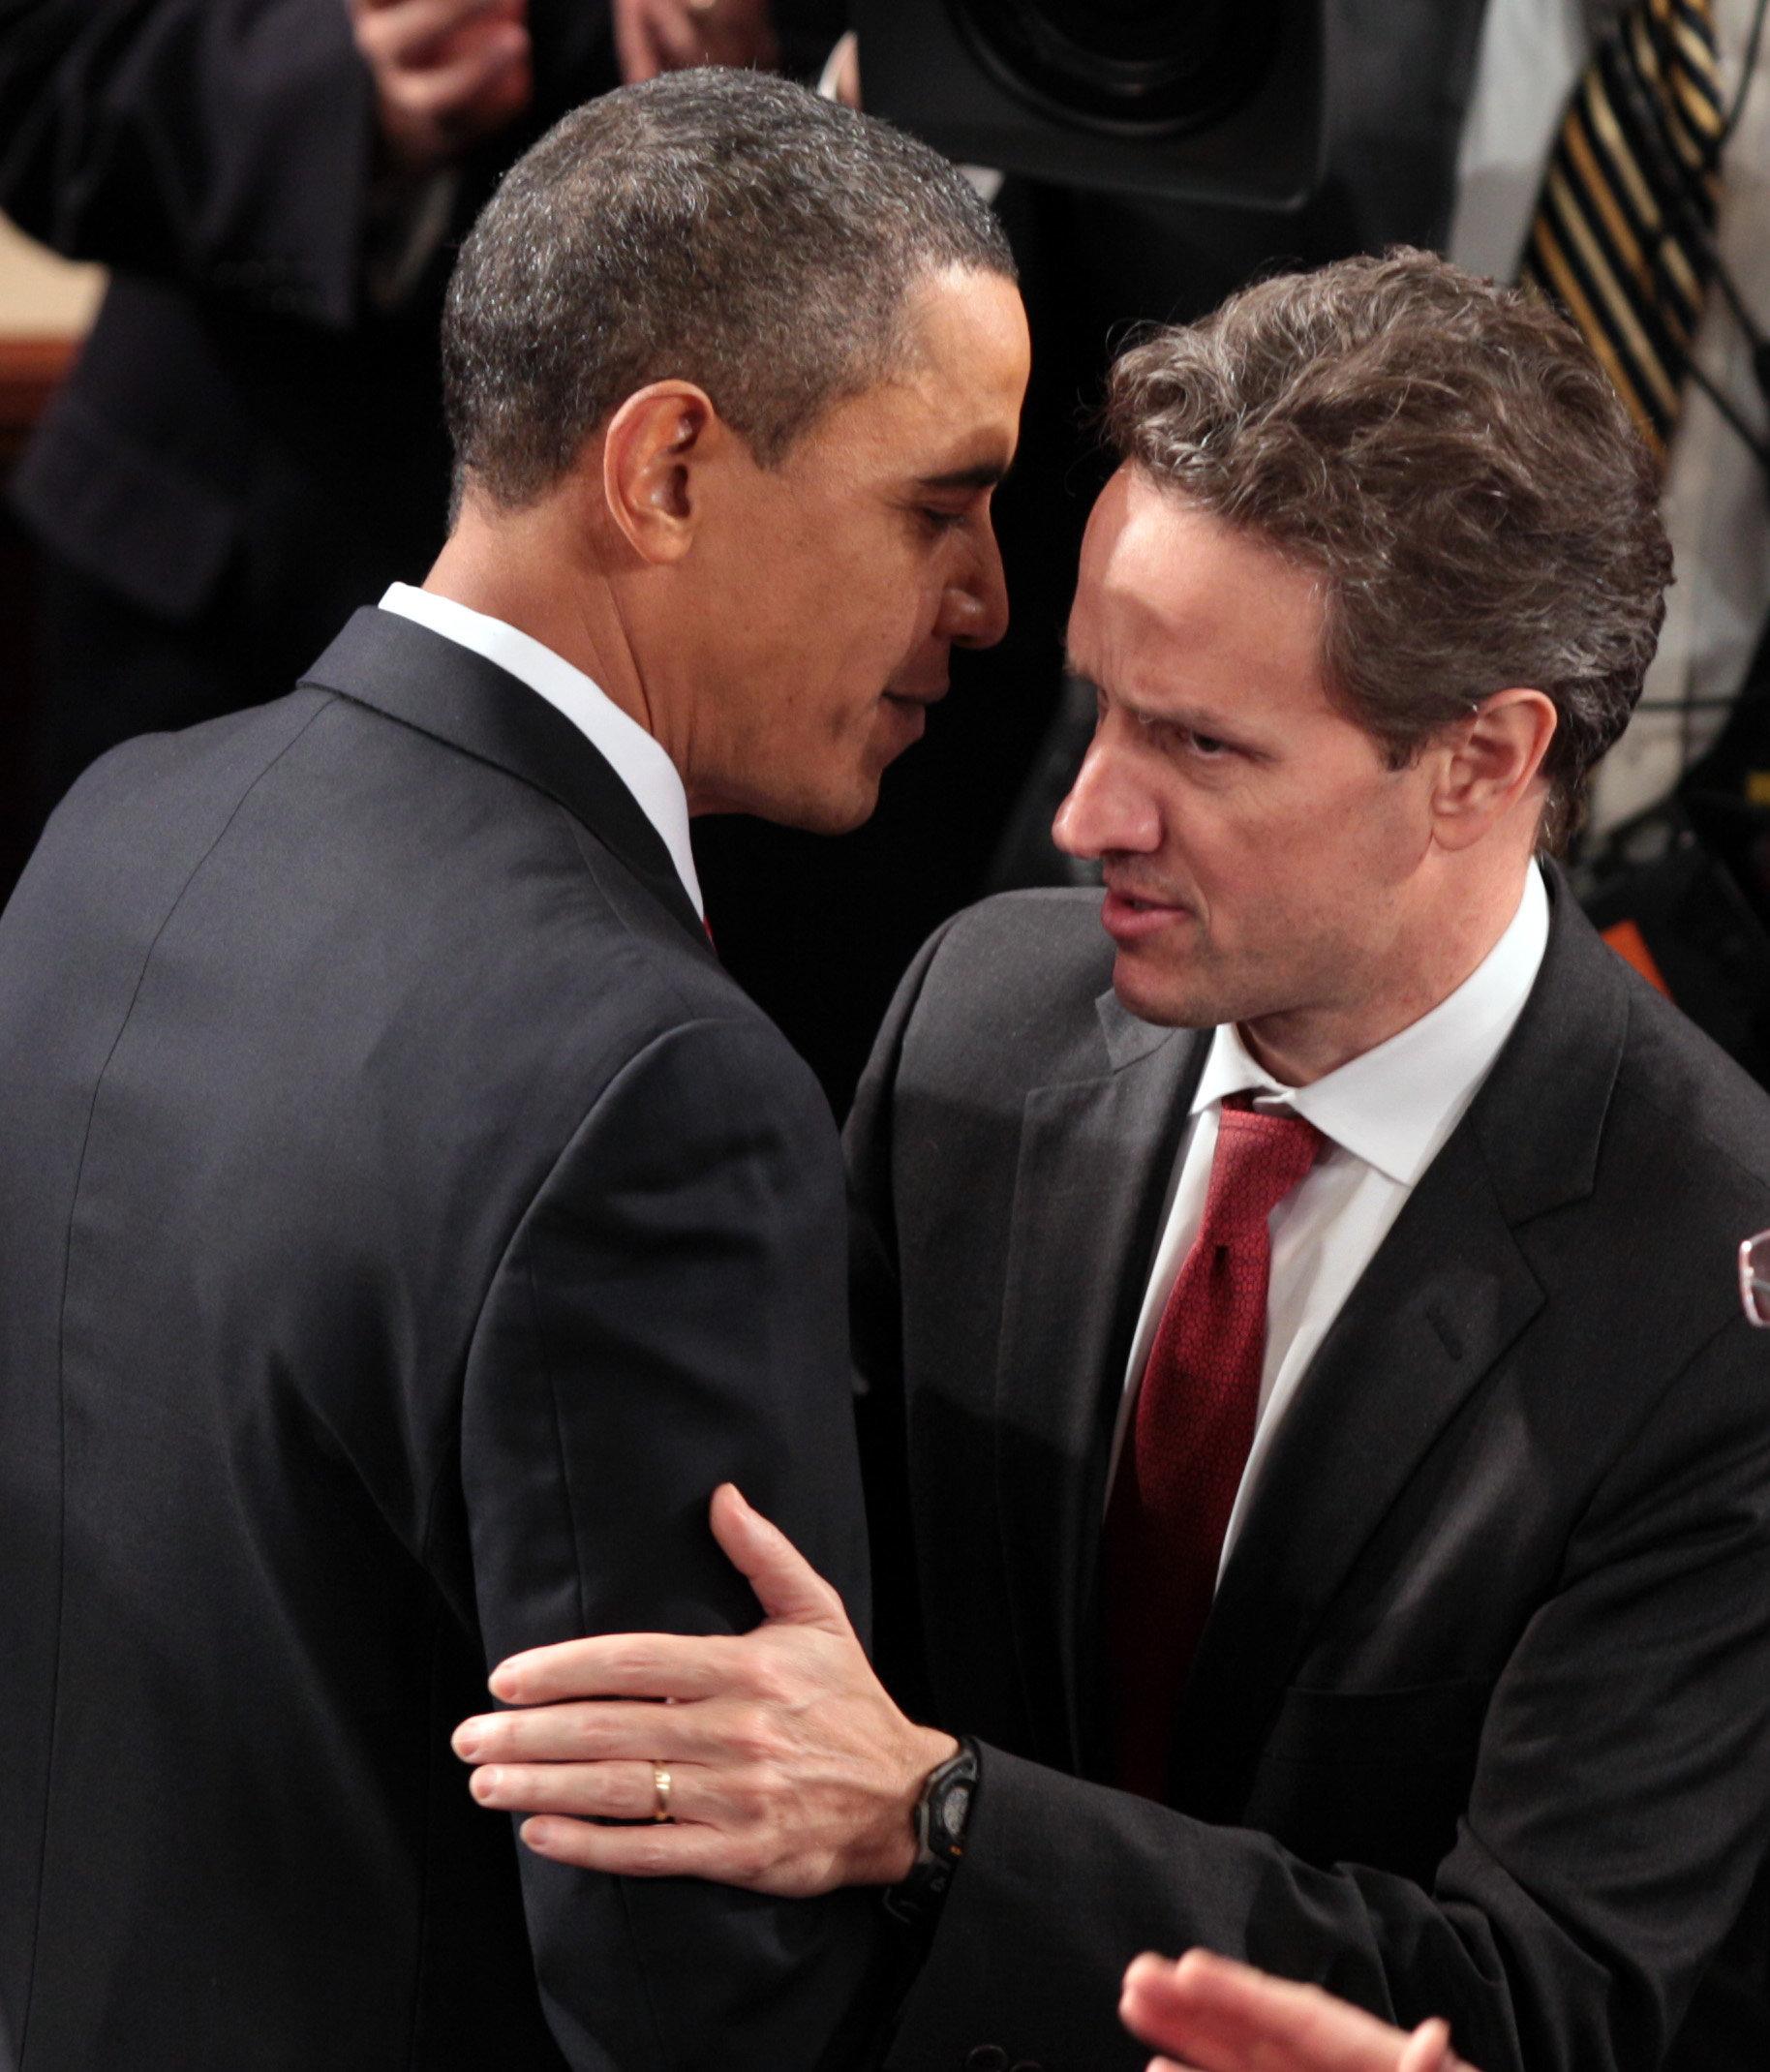 President Barack Obama greets Treasury Secretary Timothy Geithner